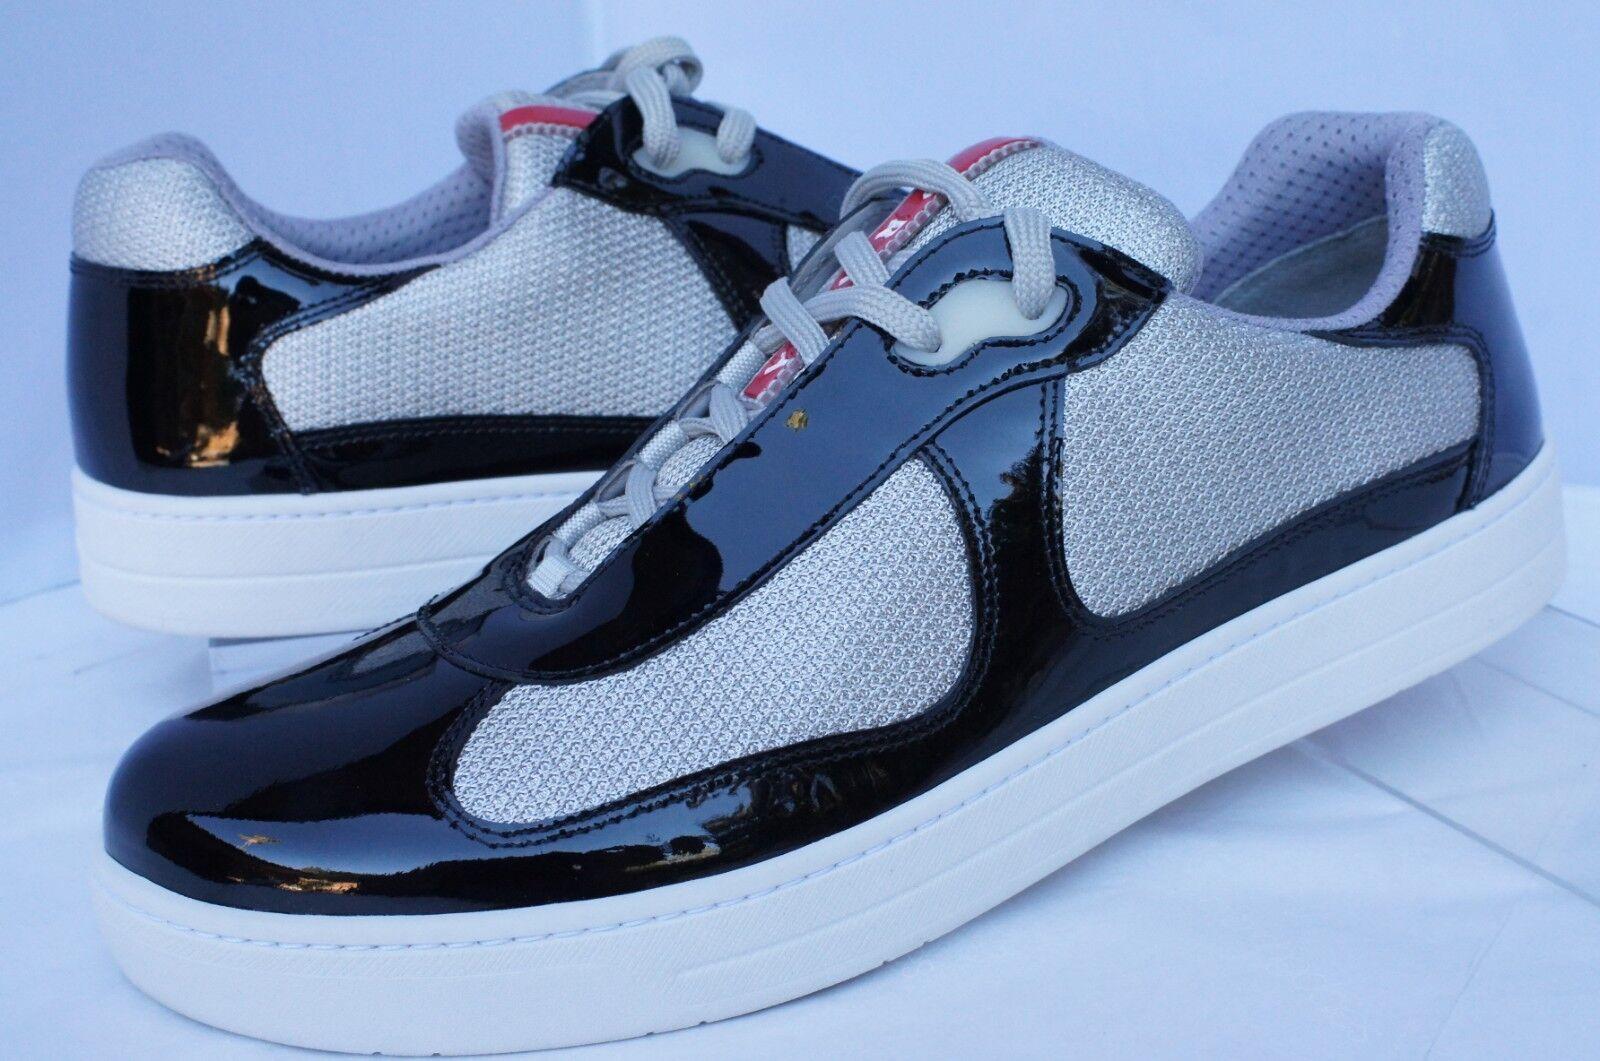 New Prada Men's Tennis Shoes Sneakers Size 9 Black Vernice Bike Calzature Uomo